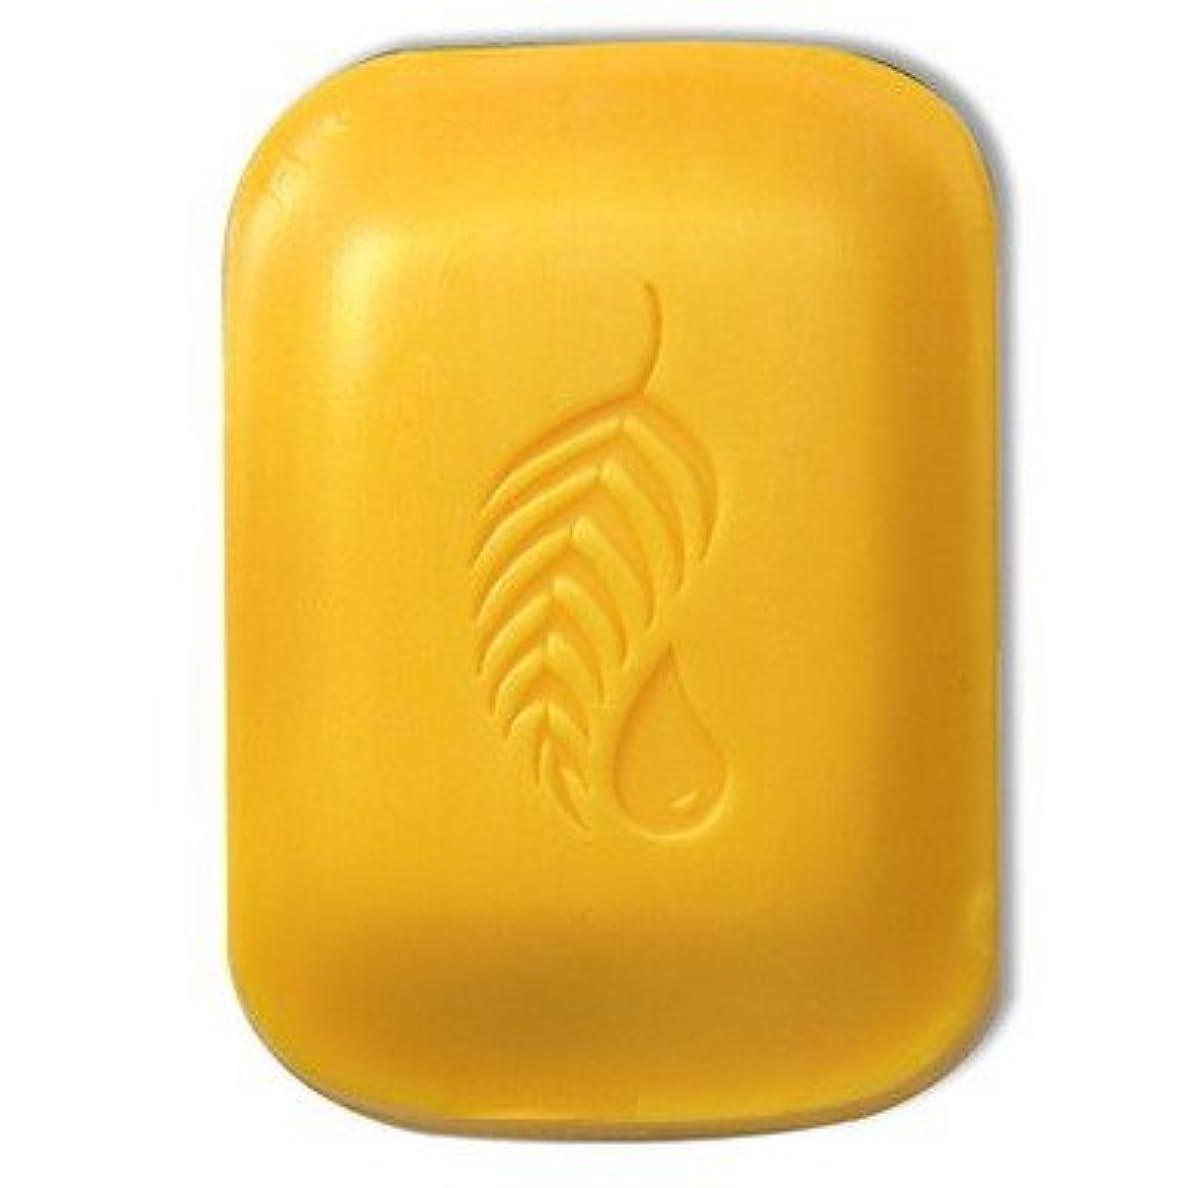 【Melaleuca(メラルーカ)】ゴールド バー トライアルサイズ42.5g [並行輸入品]